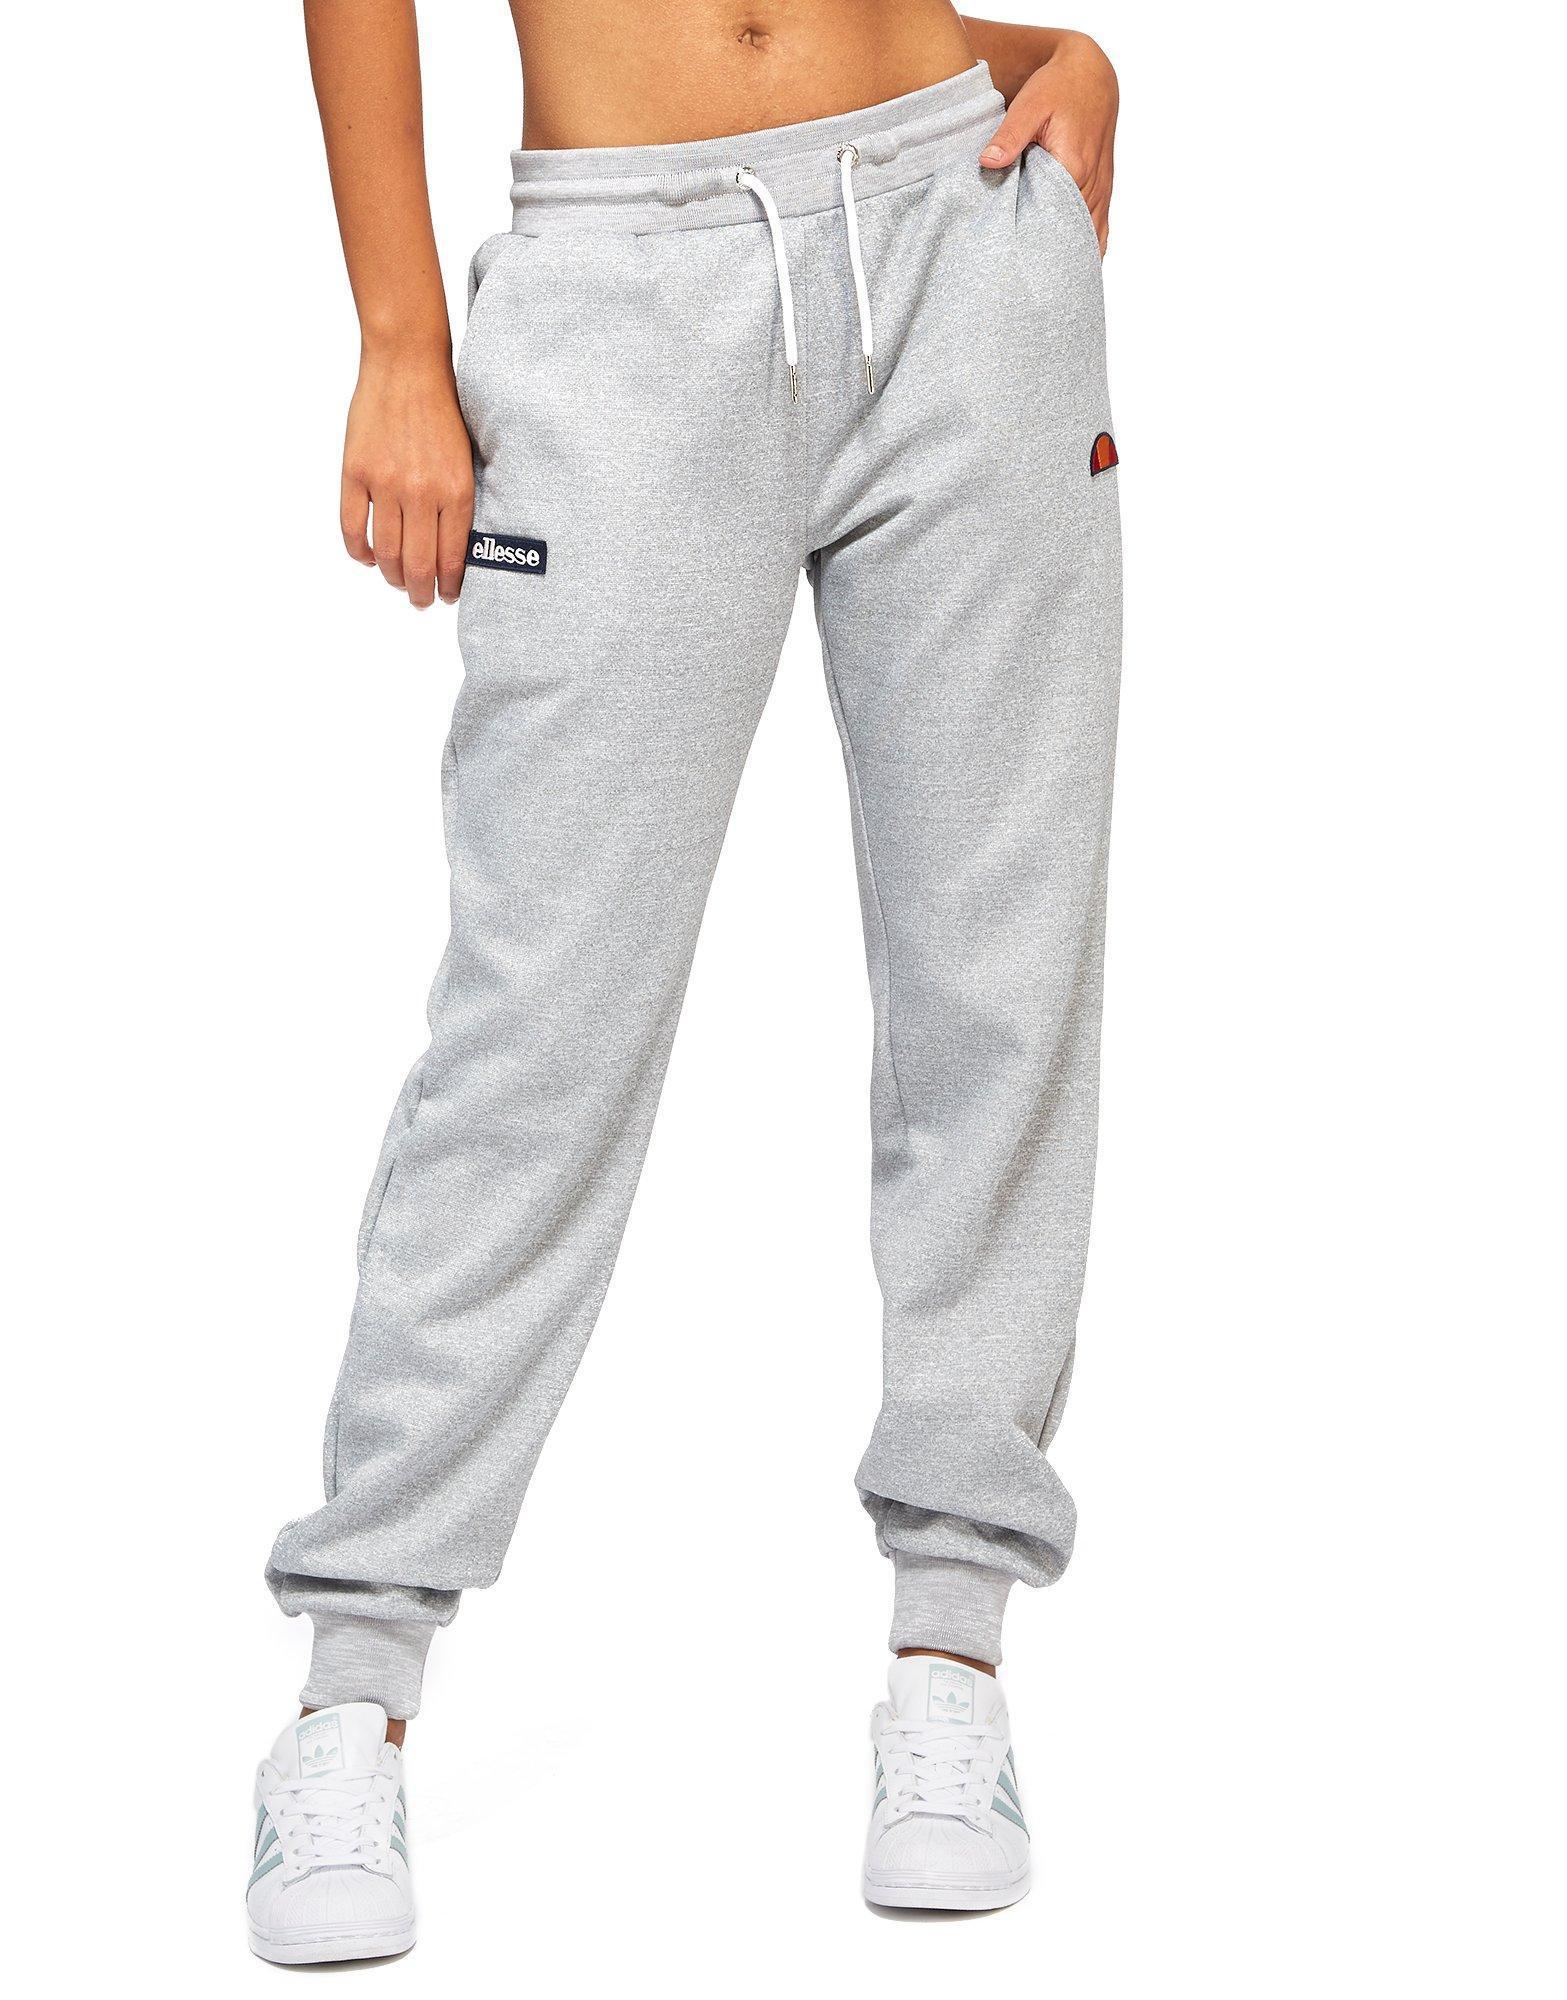 a6321ce339 Ellesse White Jema Track Pants